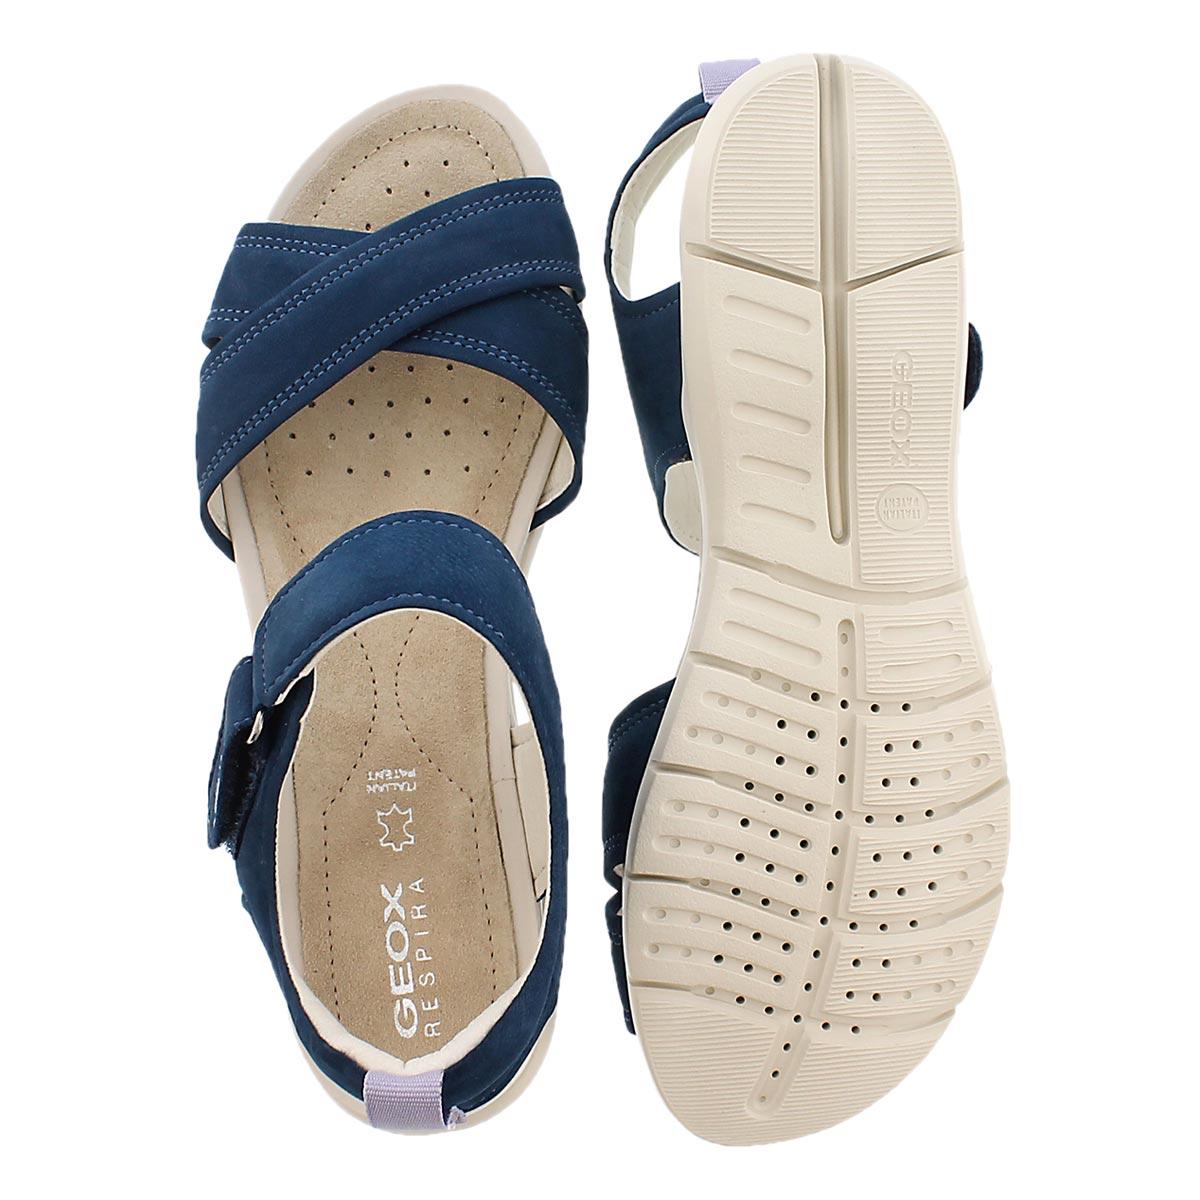 Lds Sukie denim casual sandal